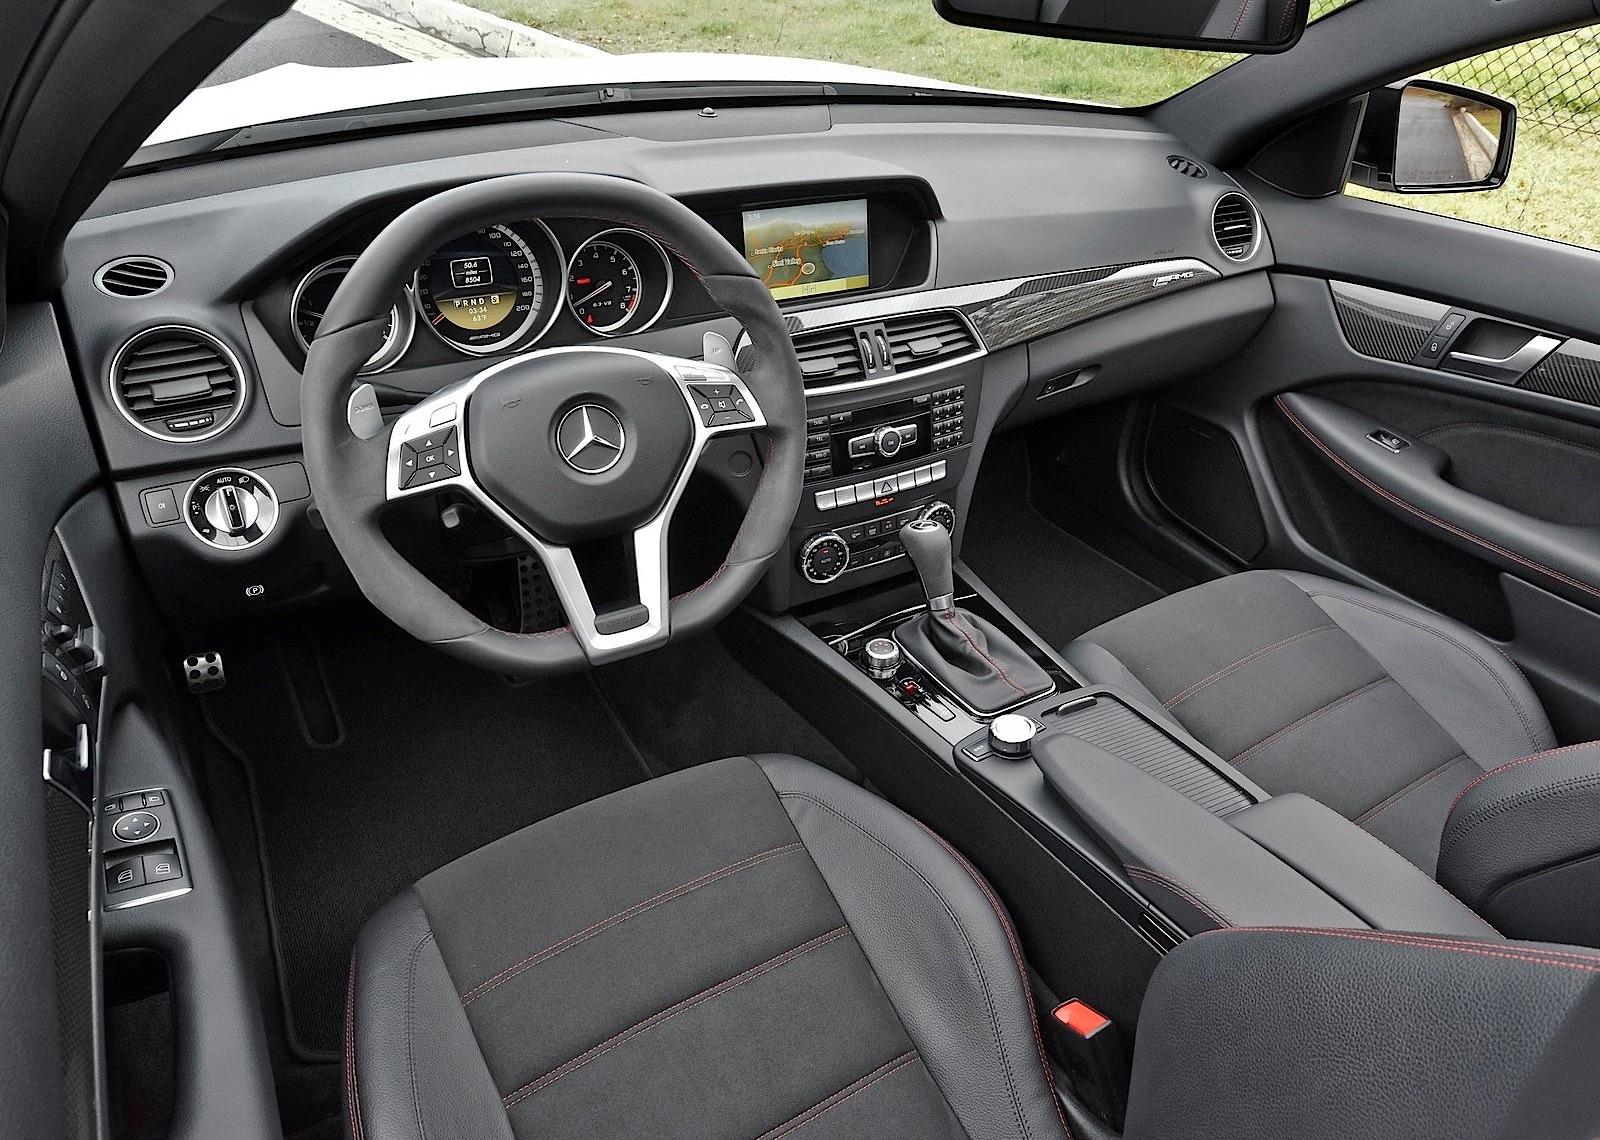 Mercedes Benz C 63 Amg Coupe Black Series C204 Specs